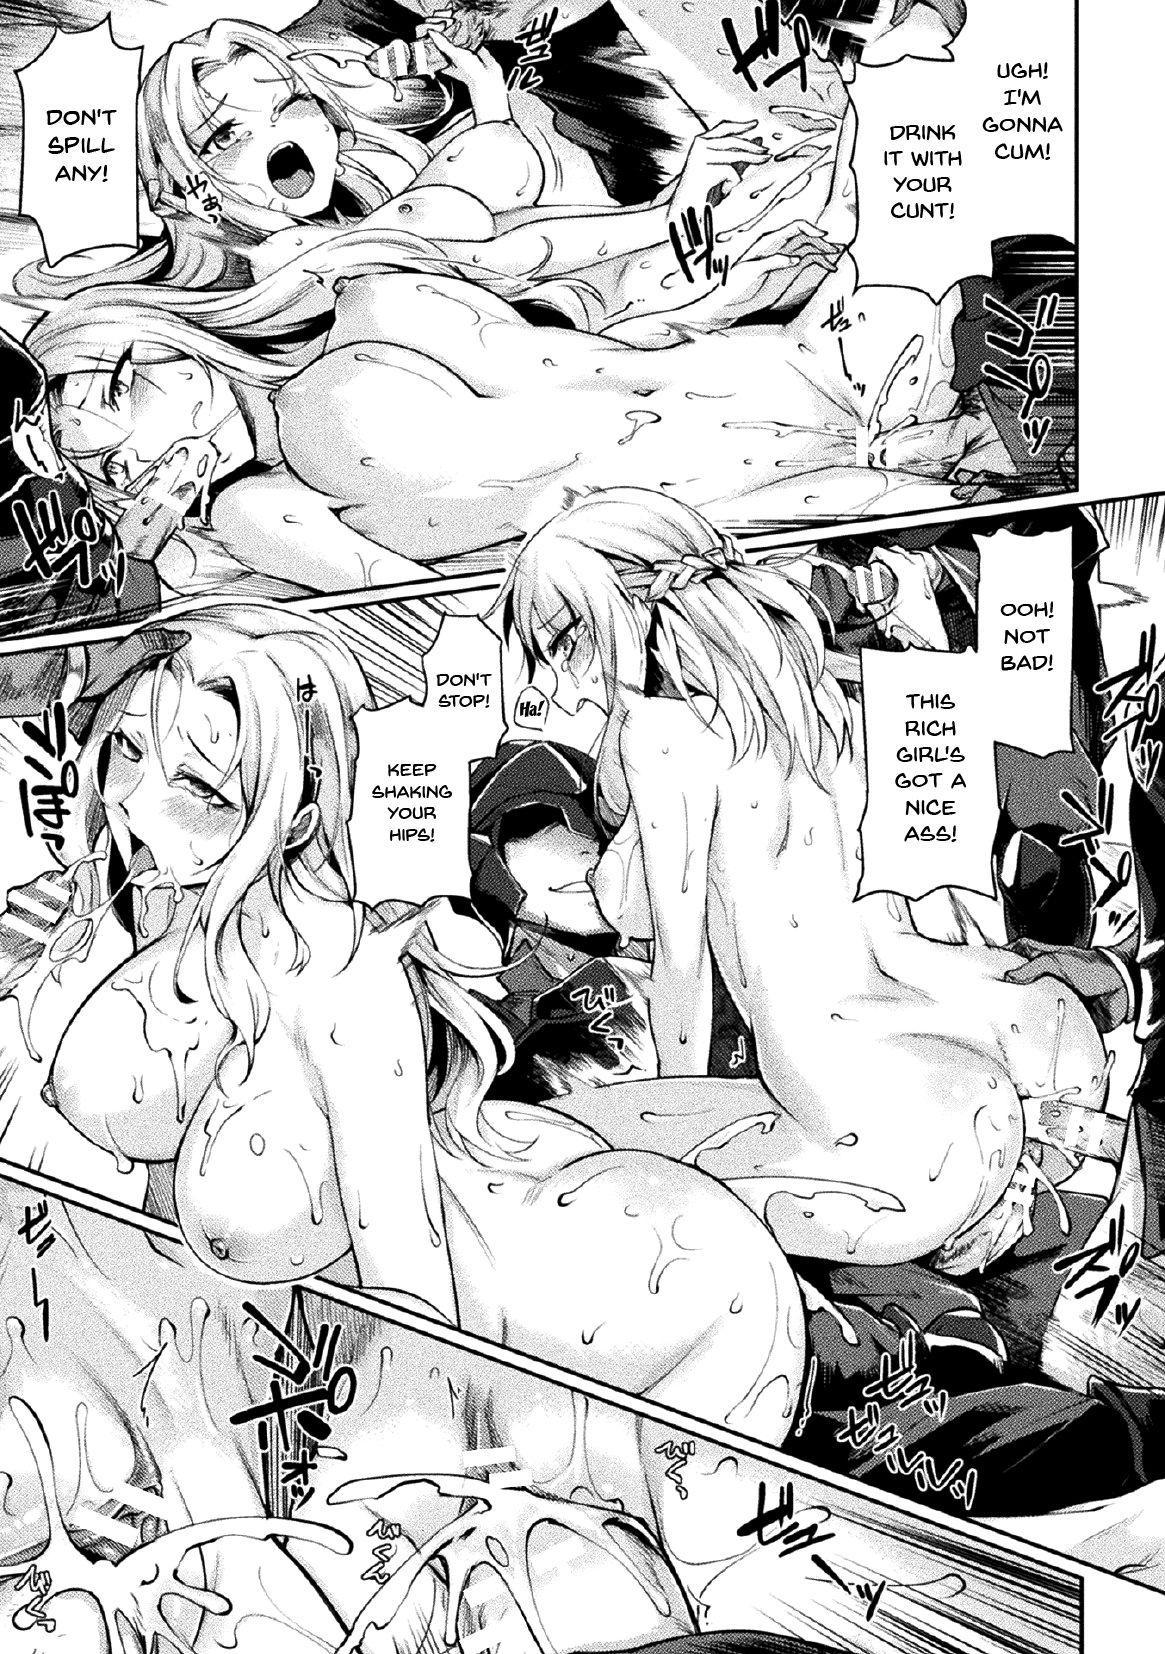 [Tsukitokage] Kuroinu II ~Inyoku ni Somaru Haitoku no Miyako, Futatabi~ THE COMIC | Kuroinu II ~Corrupted Town Stained With Lust~ THE COMIC Ch. 1 (Haiboku Otome Ecstasy Vol. 17) [English] {Doujins.com} [Digital] 2